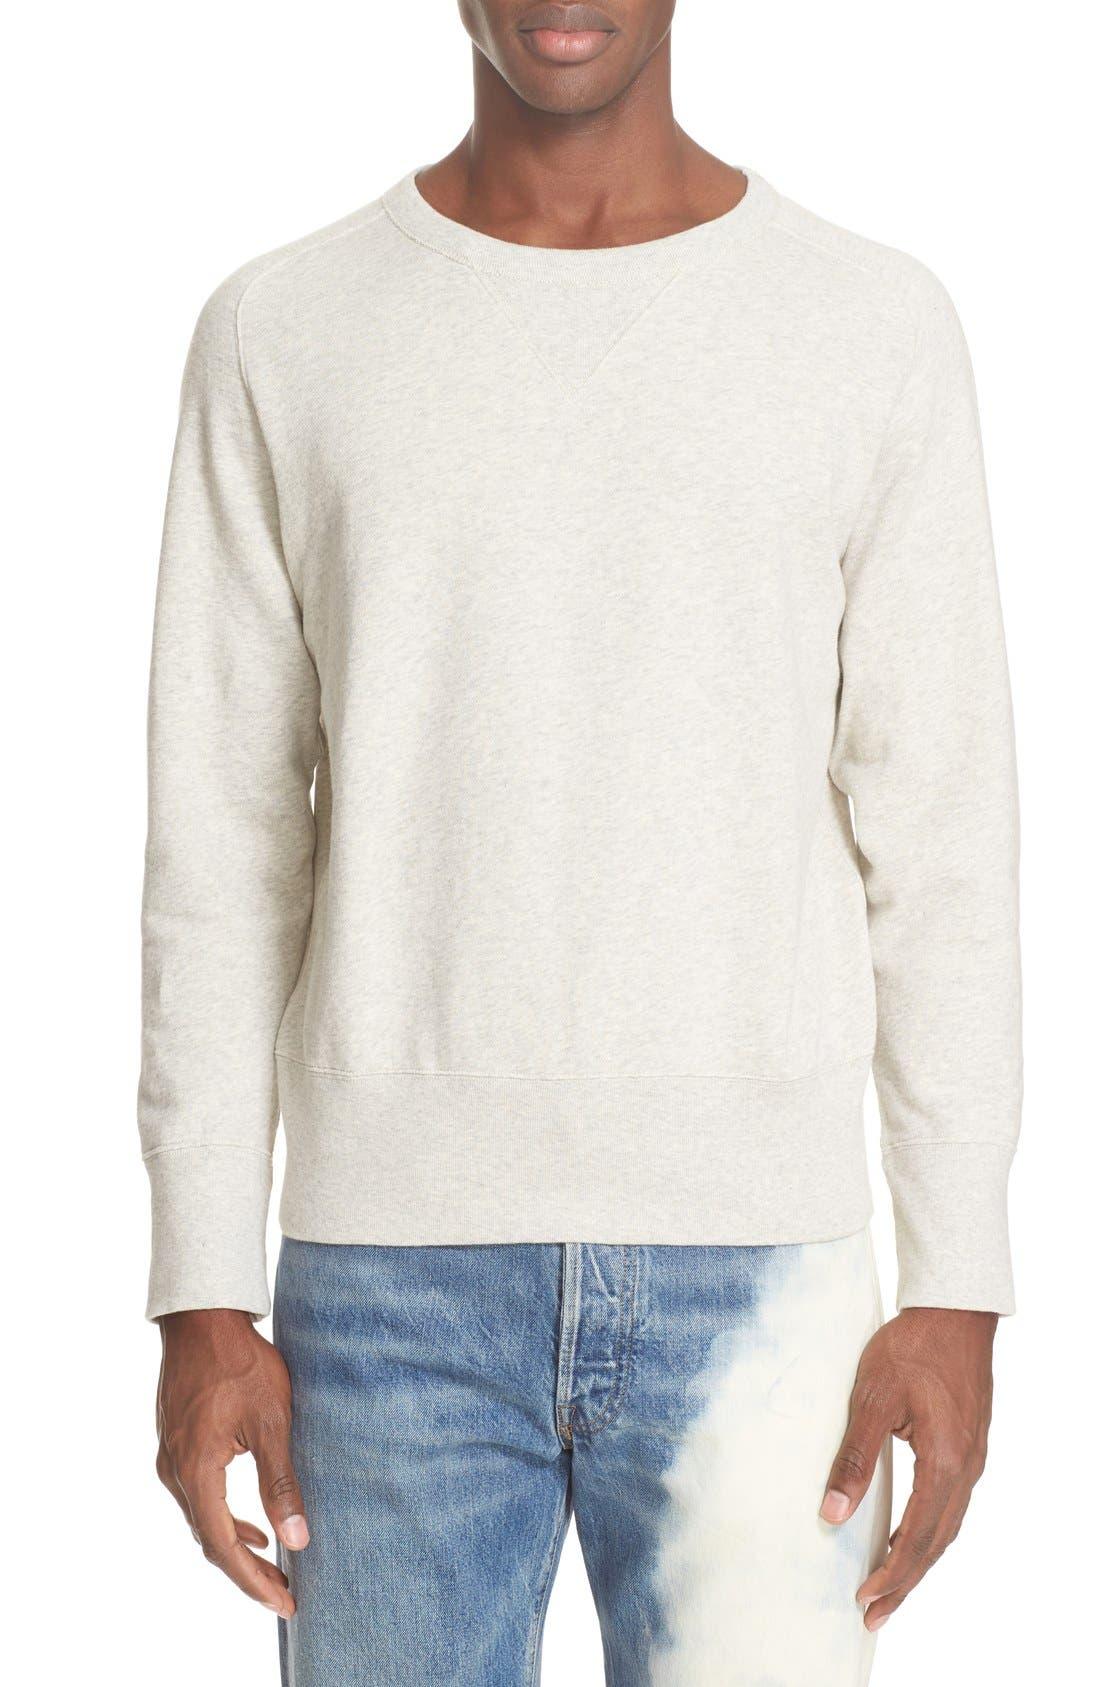 Main Image - Levi's® Vintage Clothing Bay Meadows Sweatshirt